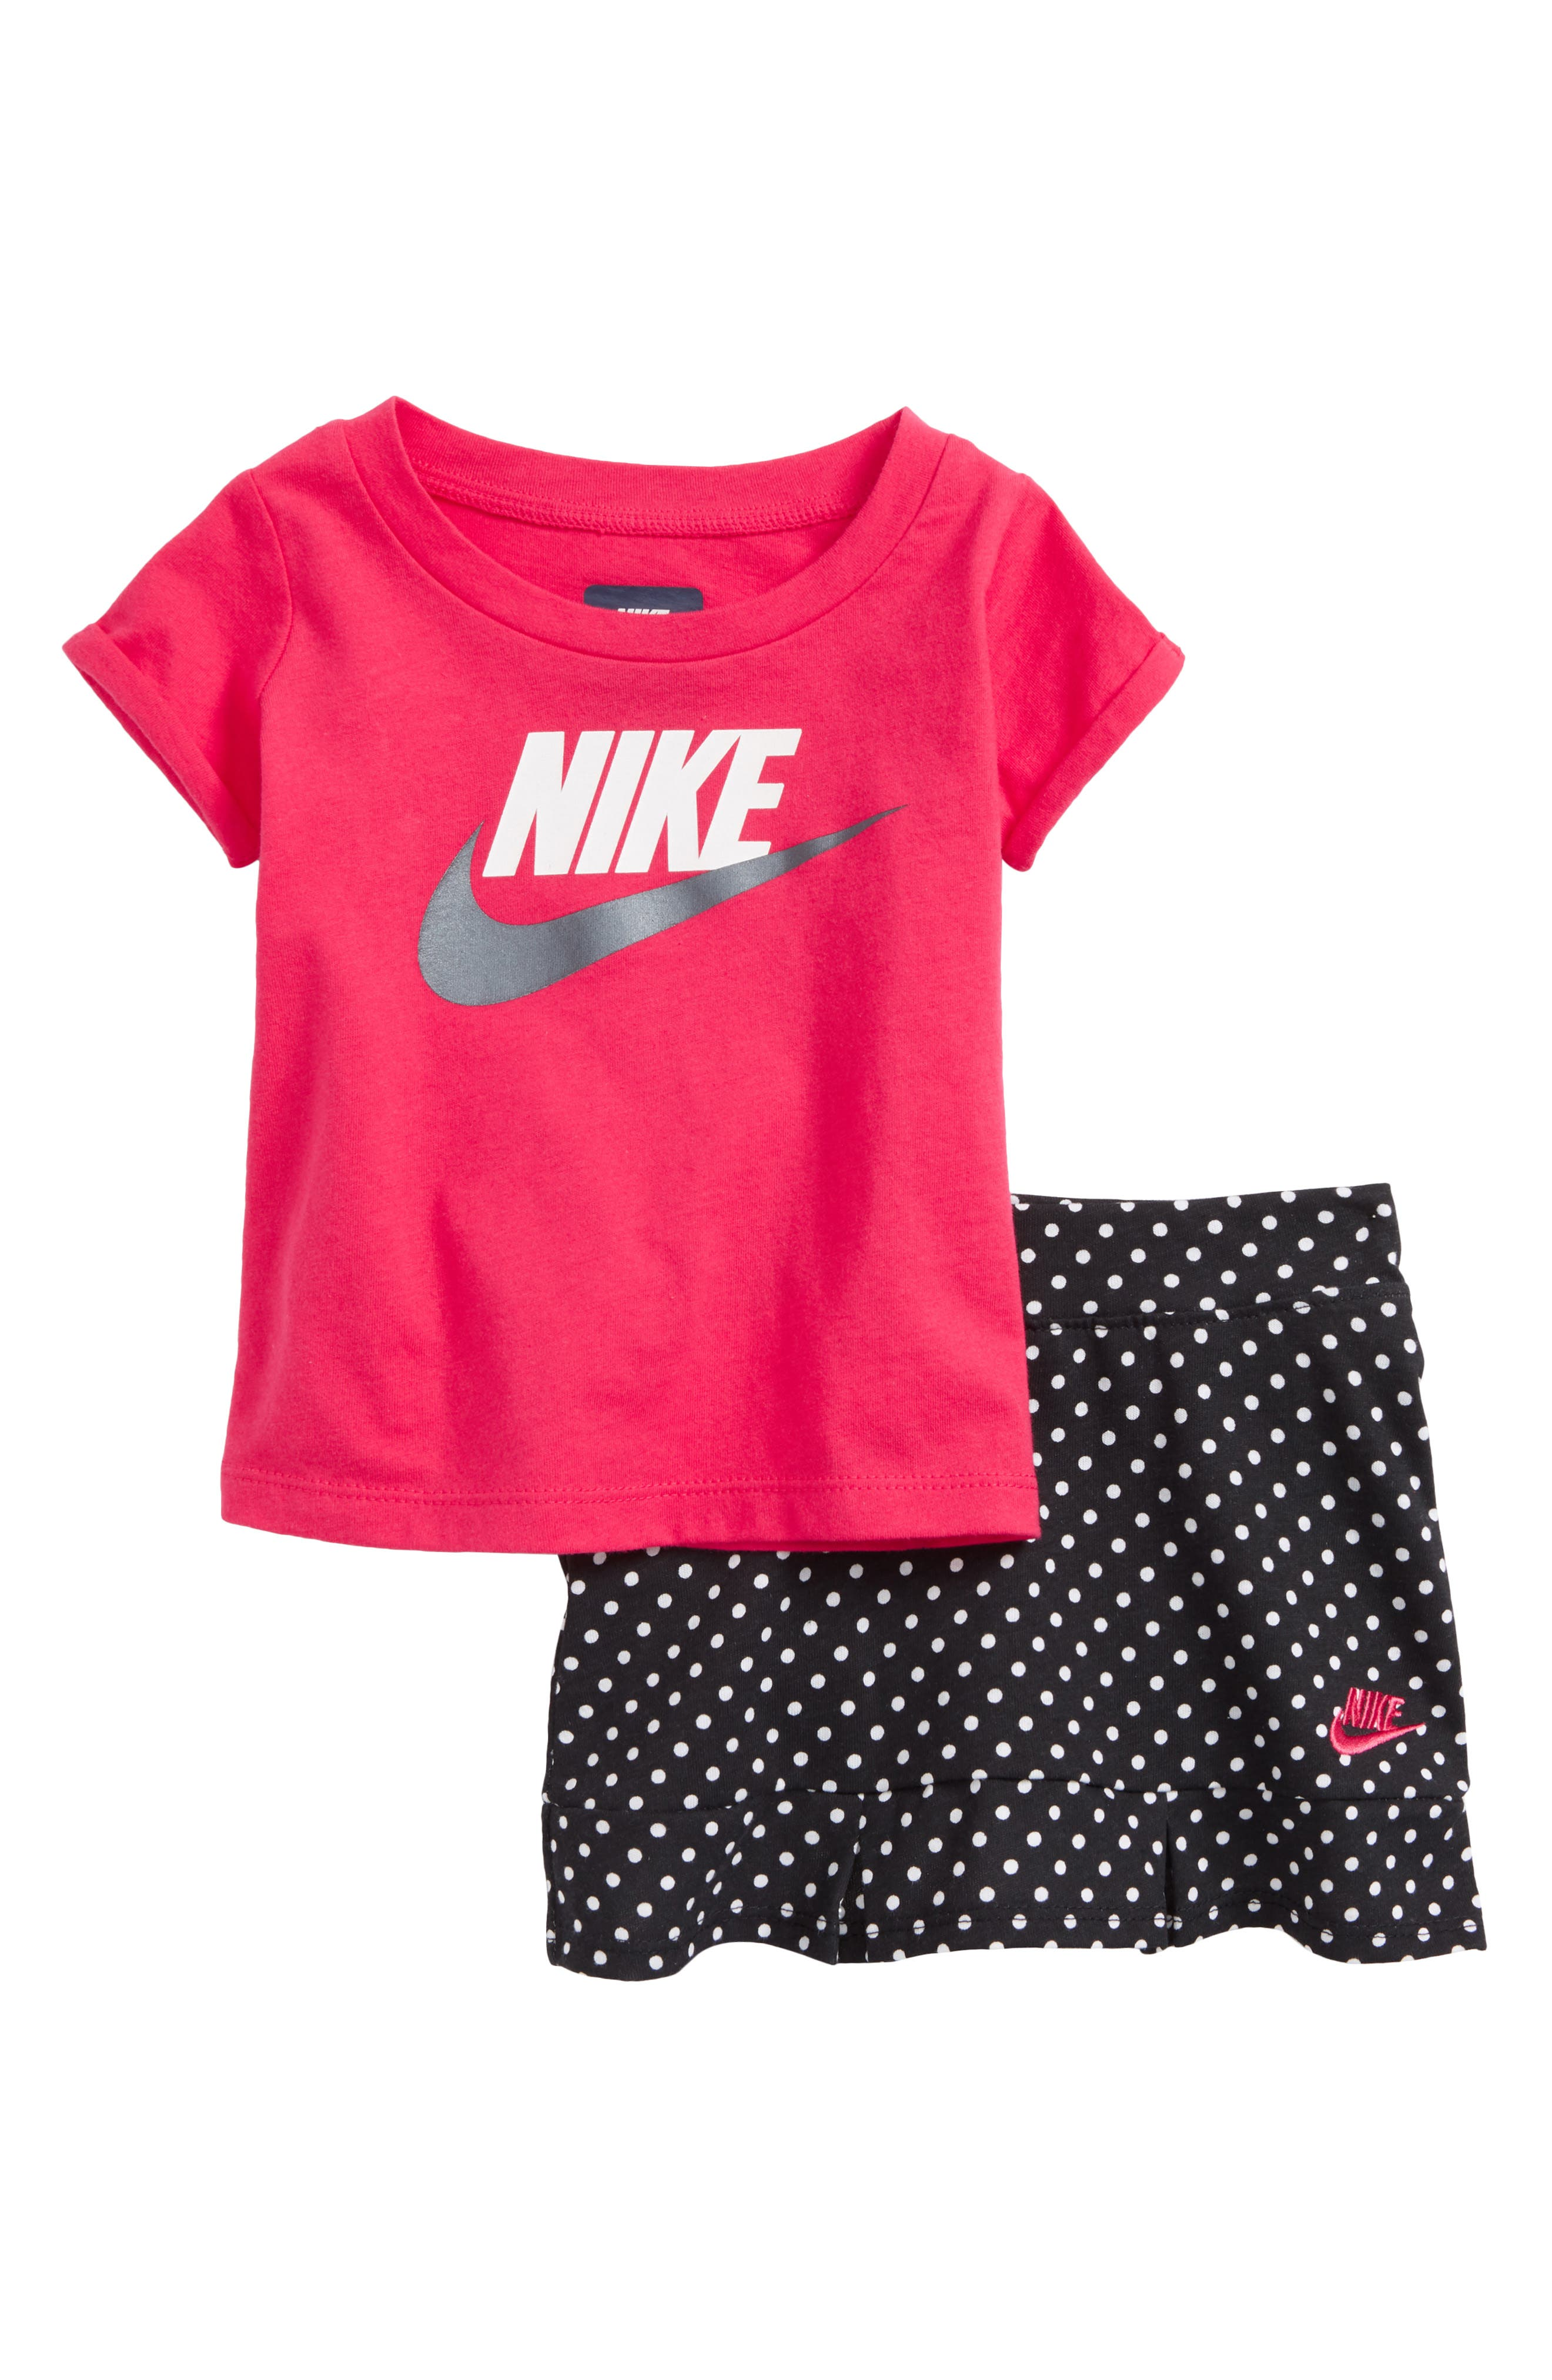 Nike Futrra Graphic Tee & Scooter Skirt Set (Baby Girls)